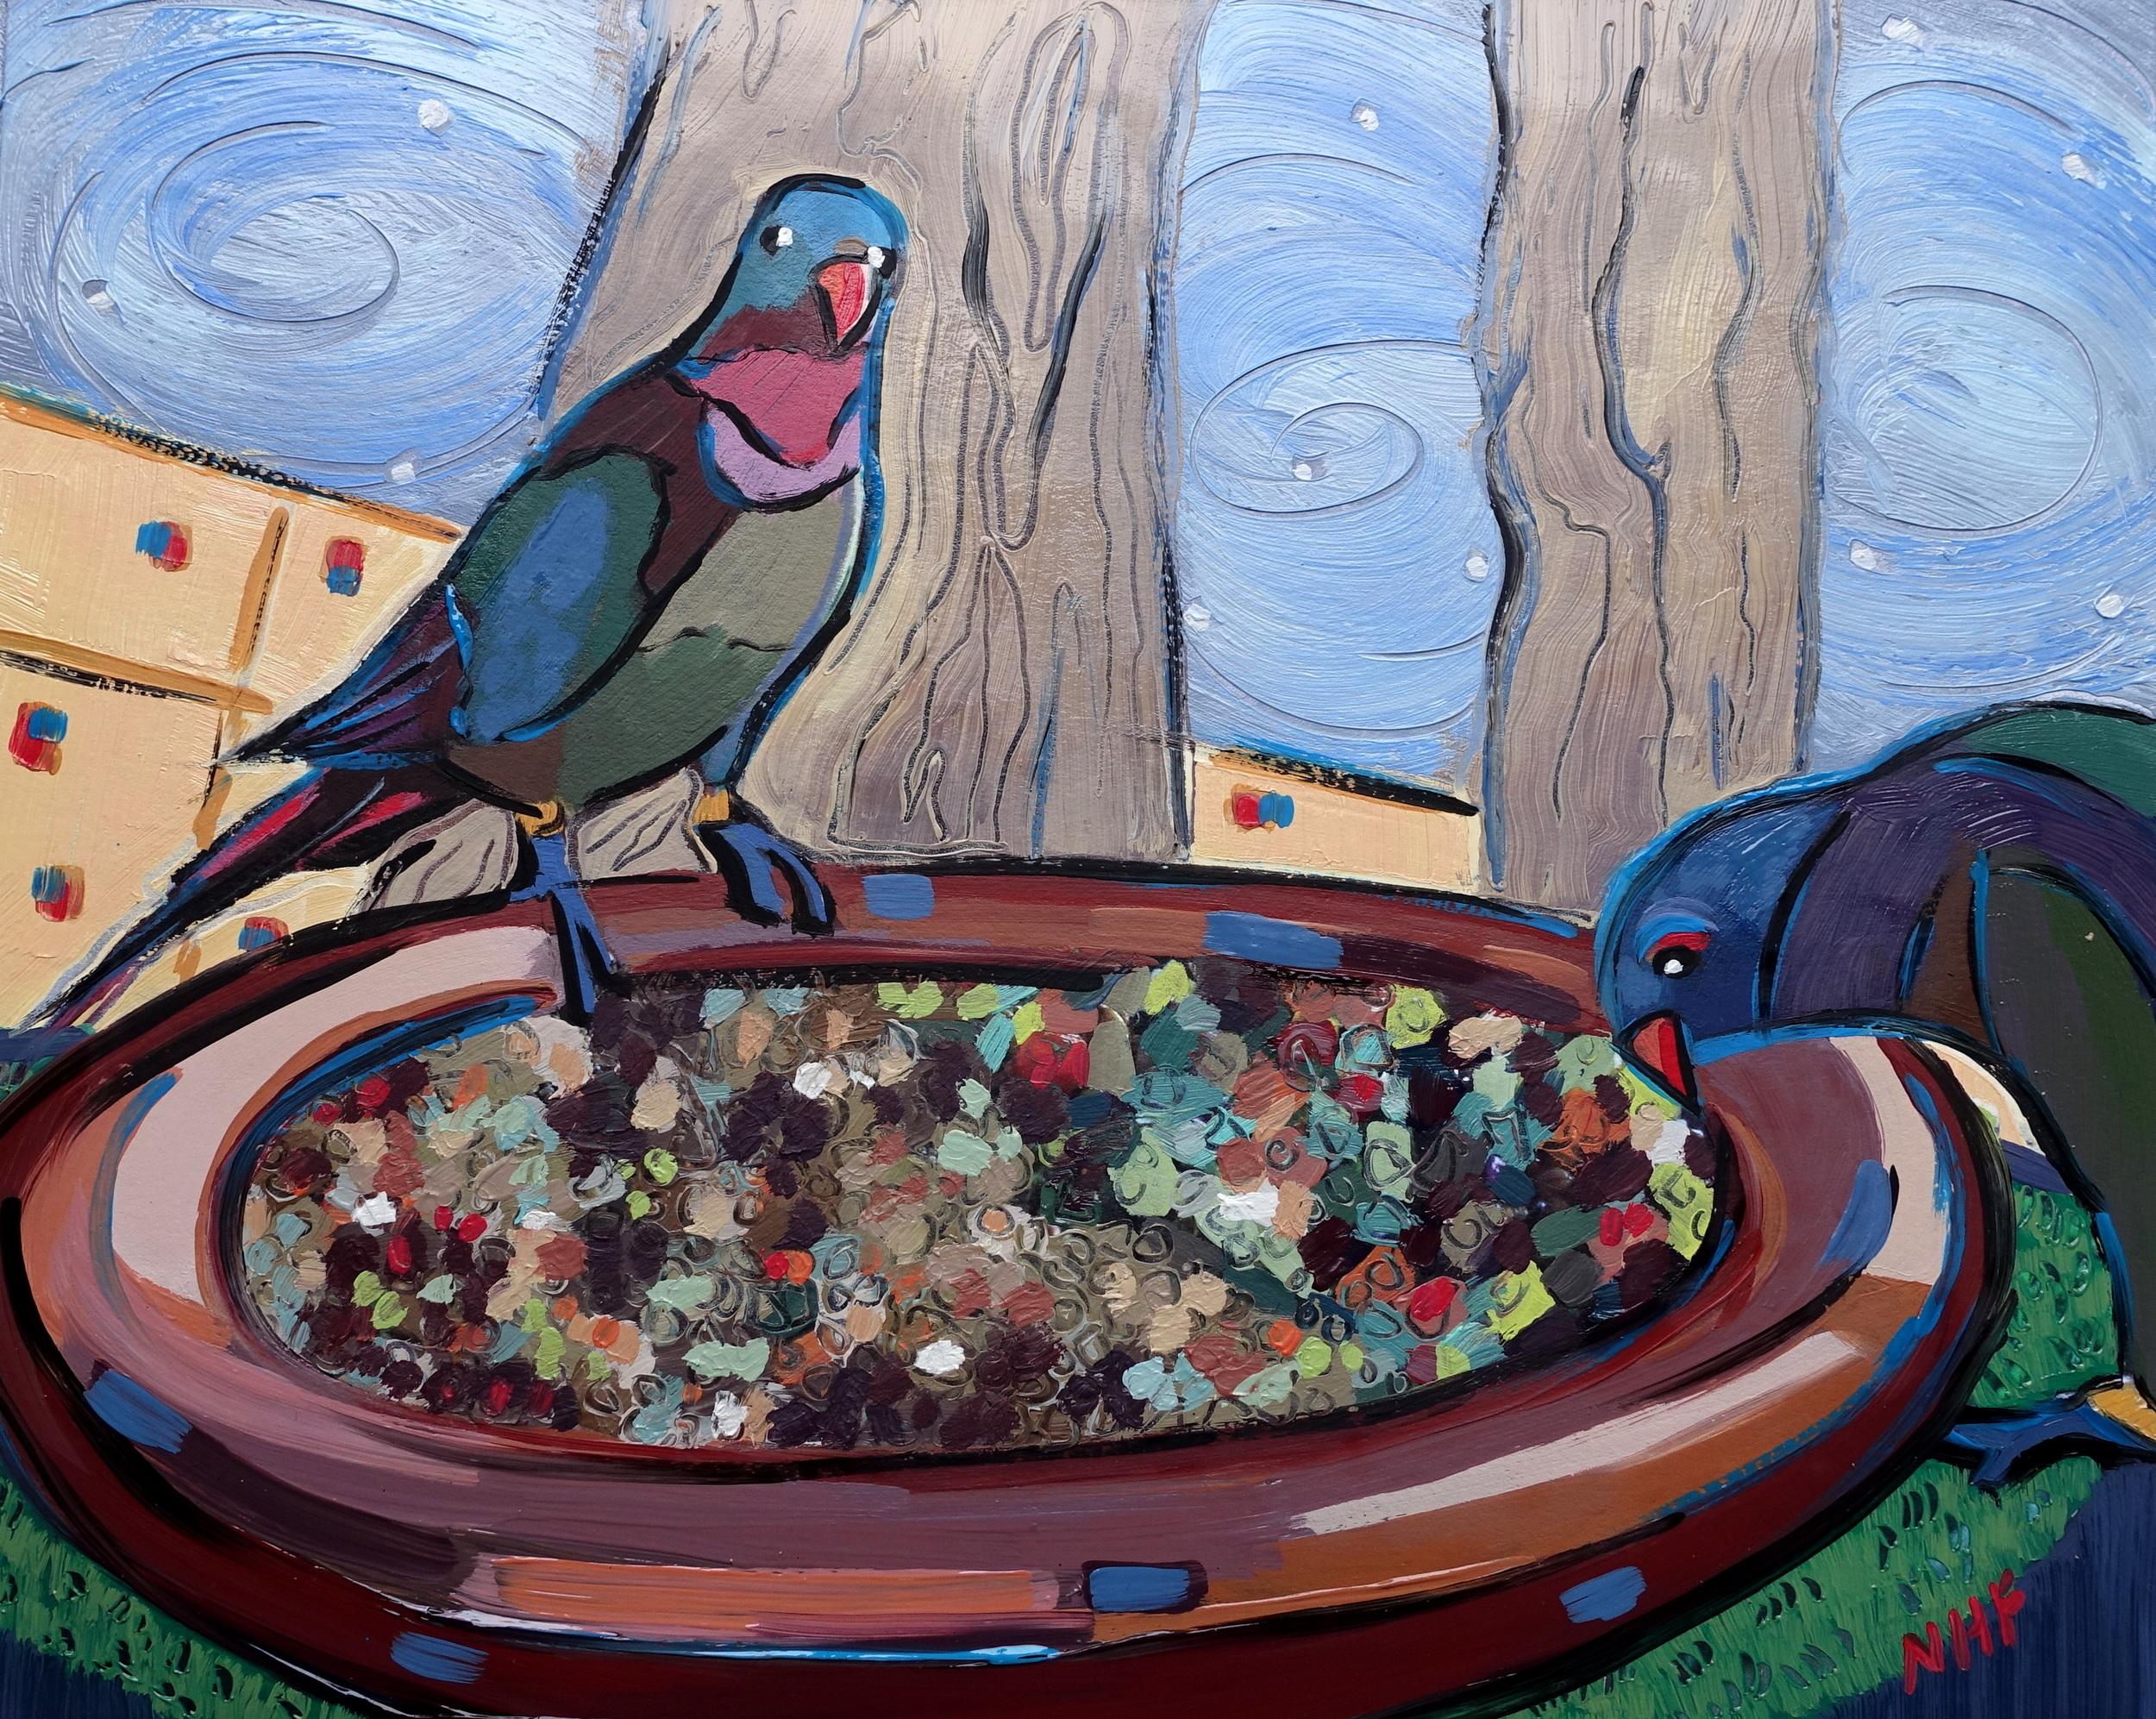 Birds Down Under 2 , oil on panel, 8x10